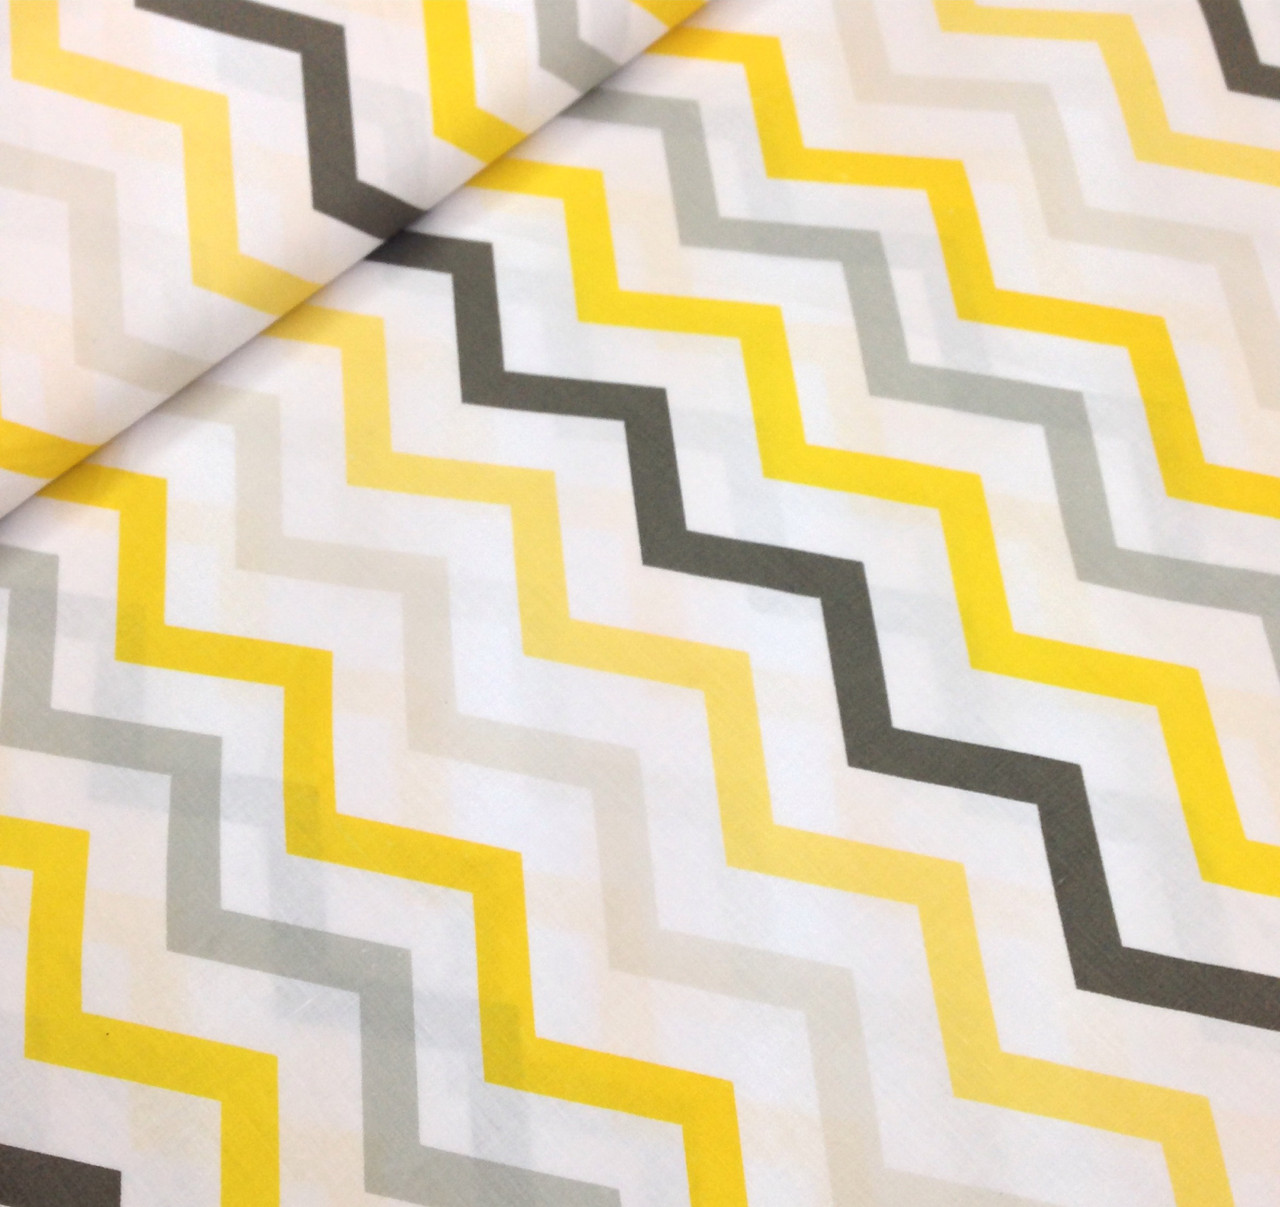 Хлопковая ткань польская зигзаг желто-серый